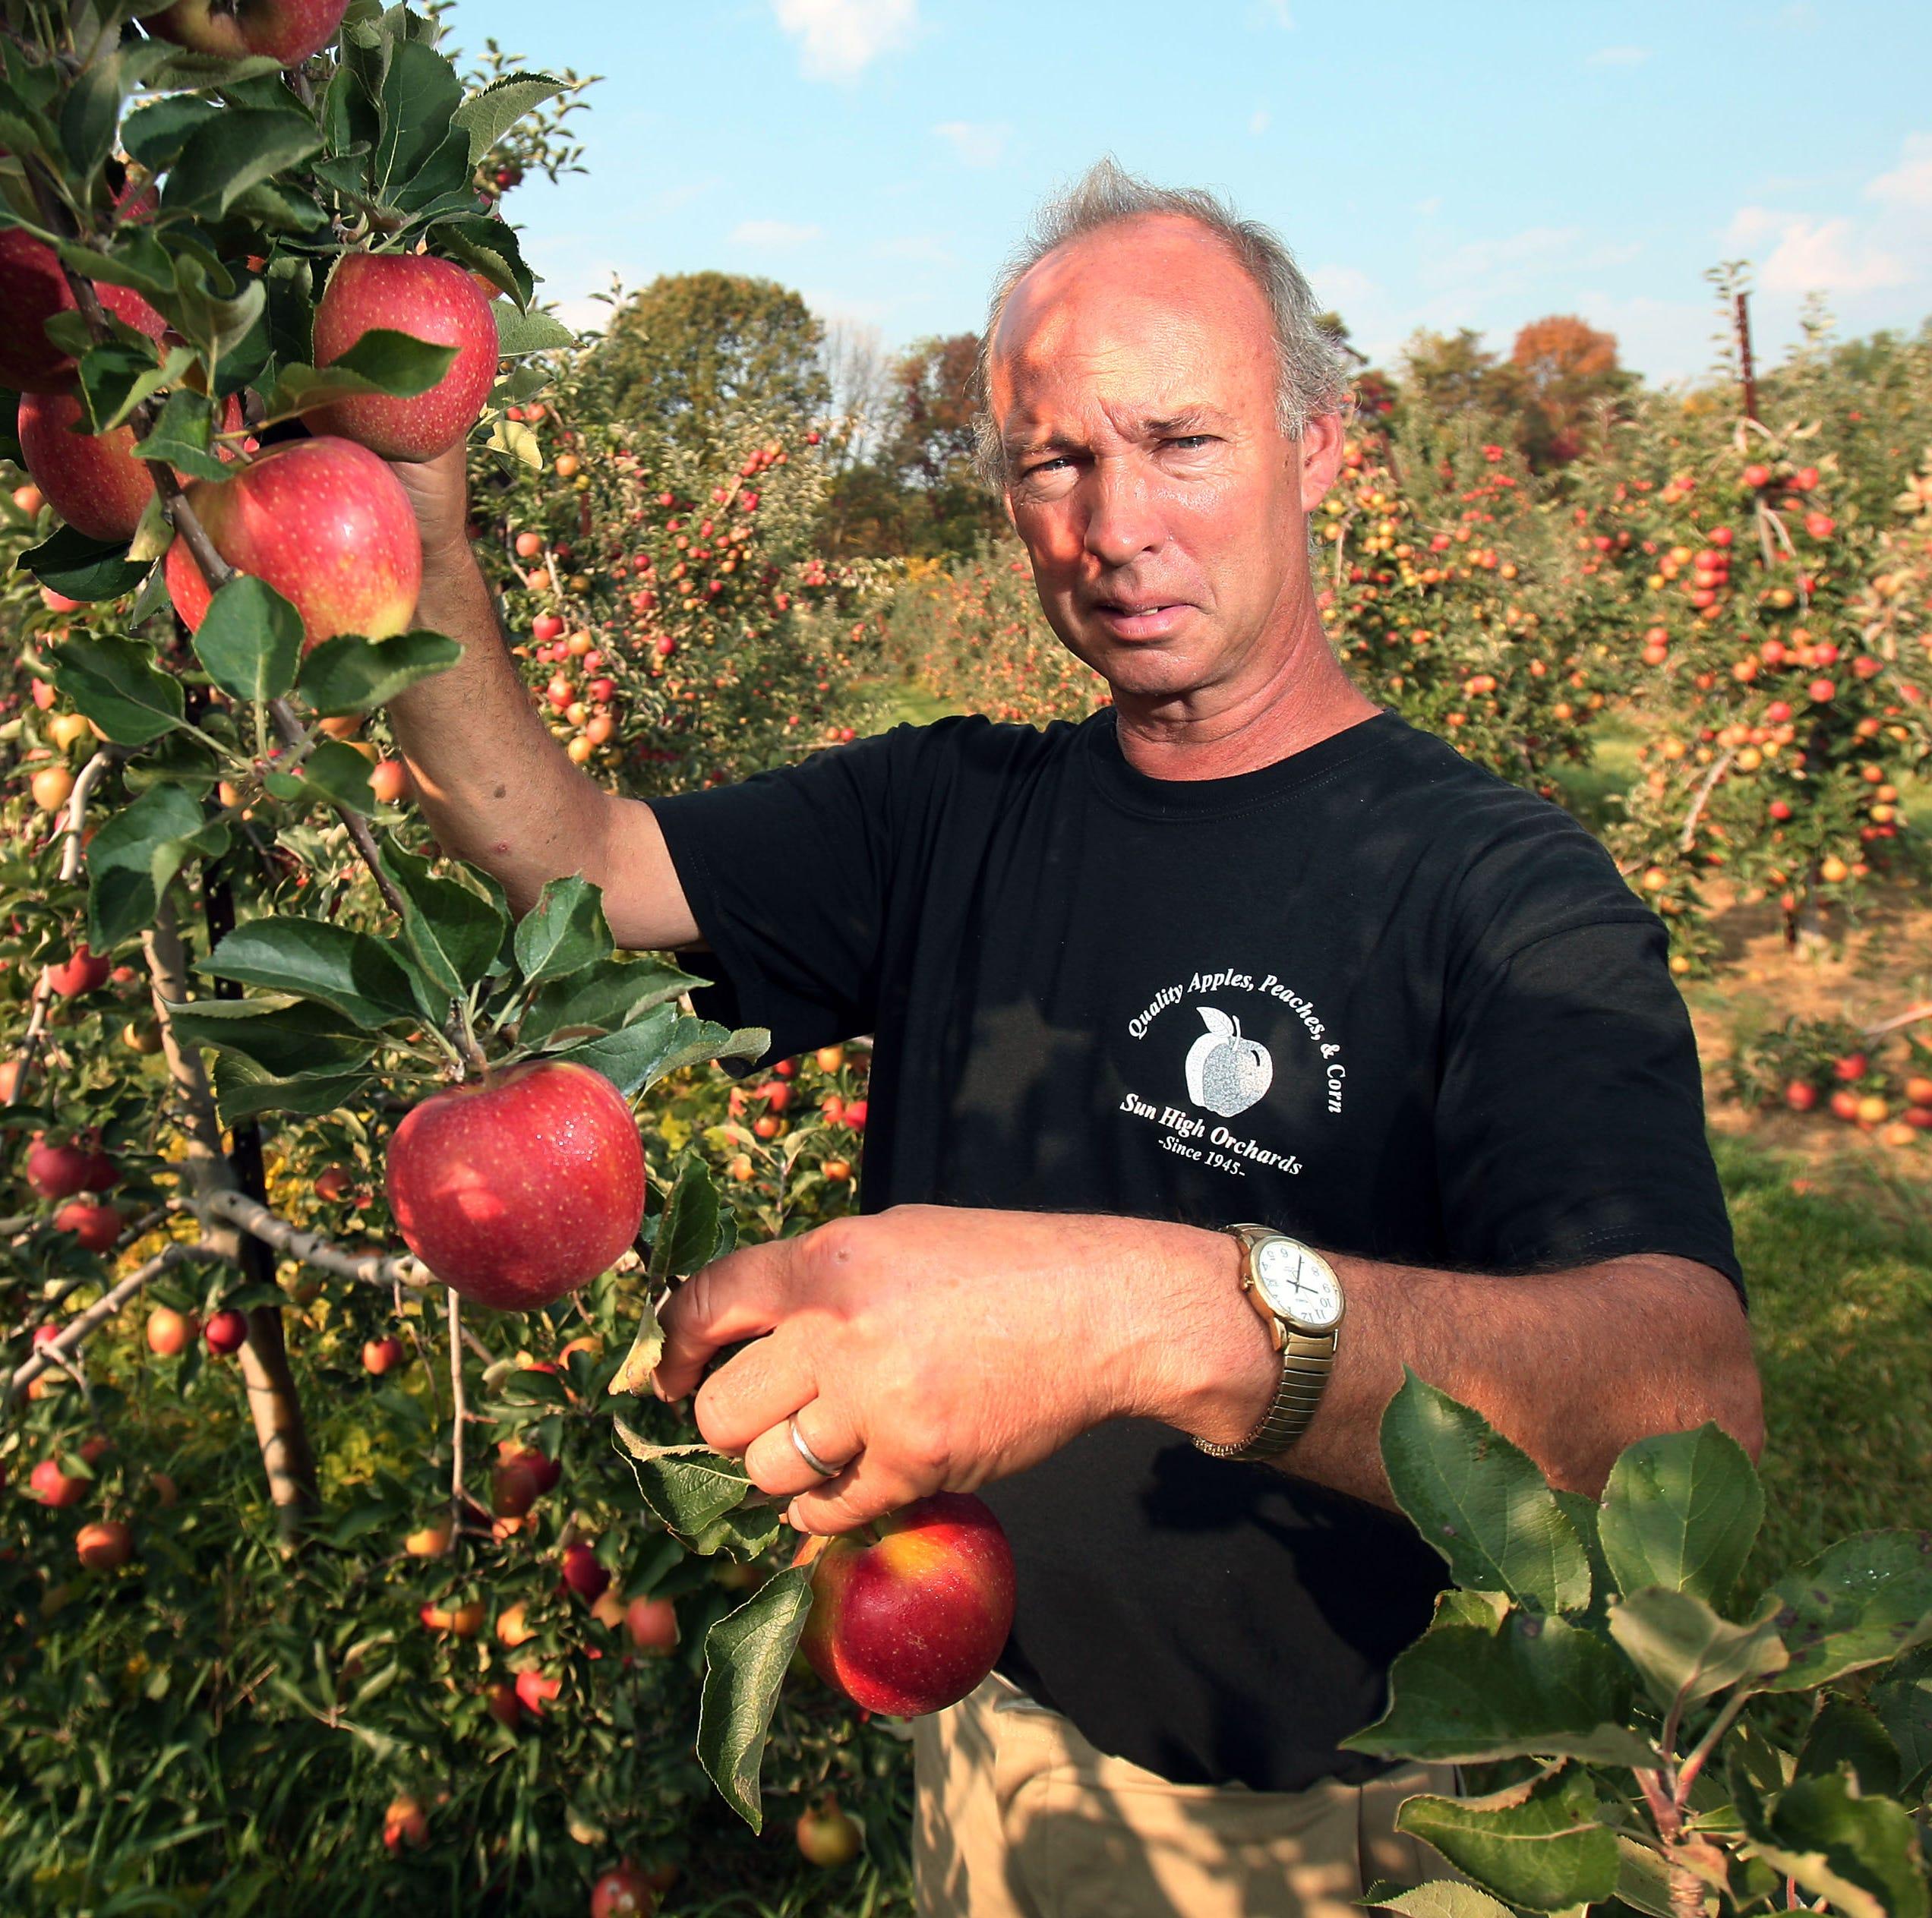 Randolph orchard bustling despite manager's arrest for groping teens